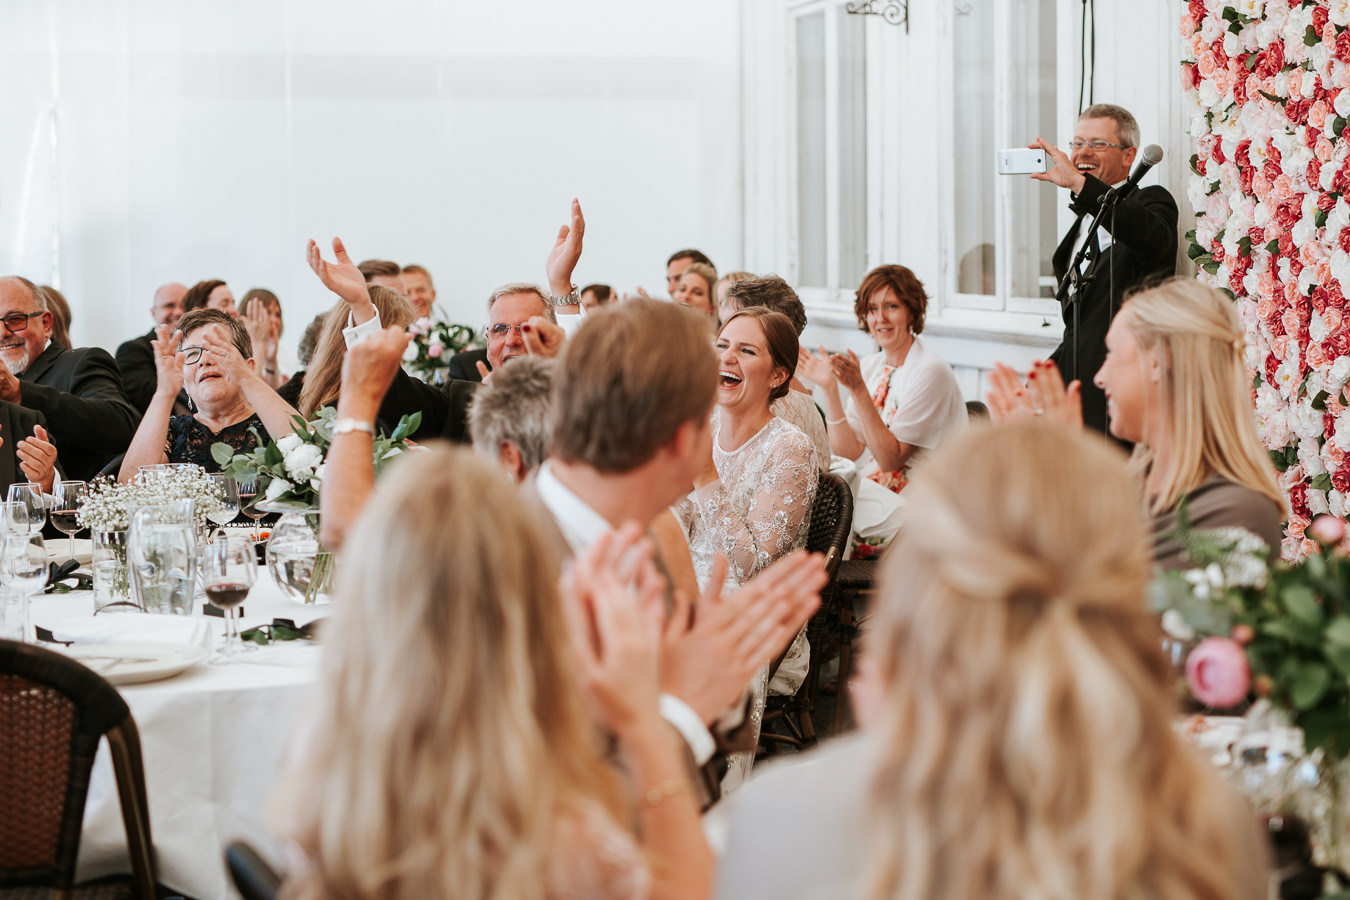 Bryllup-Hellviktangen-fotograf-tvedt-161.jpg